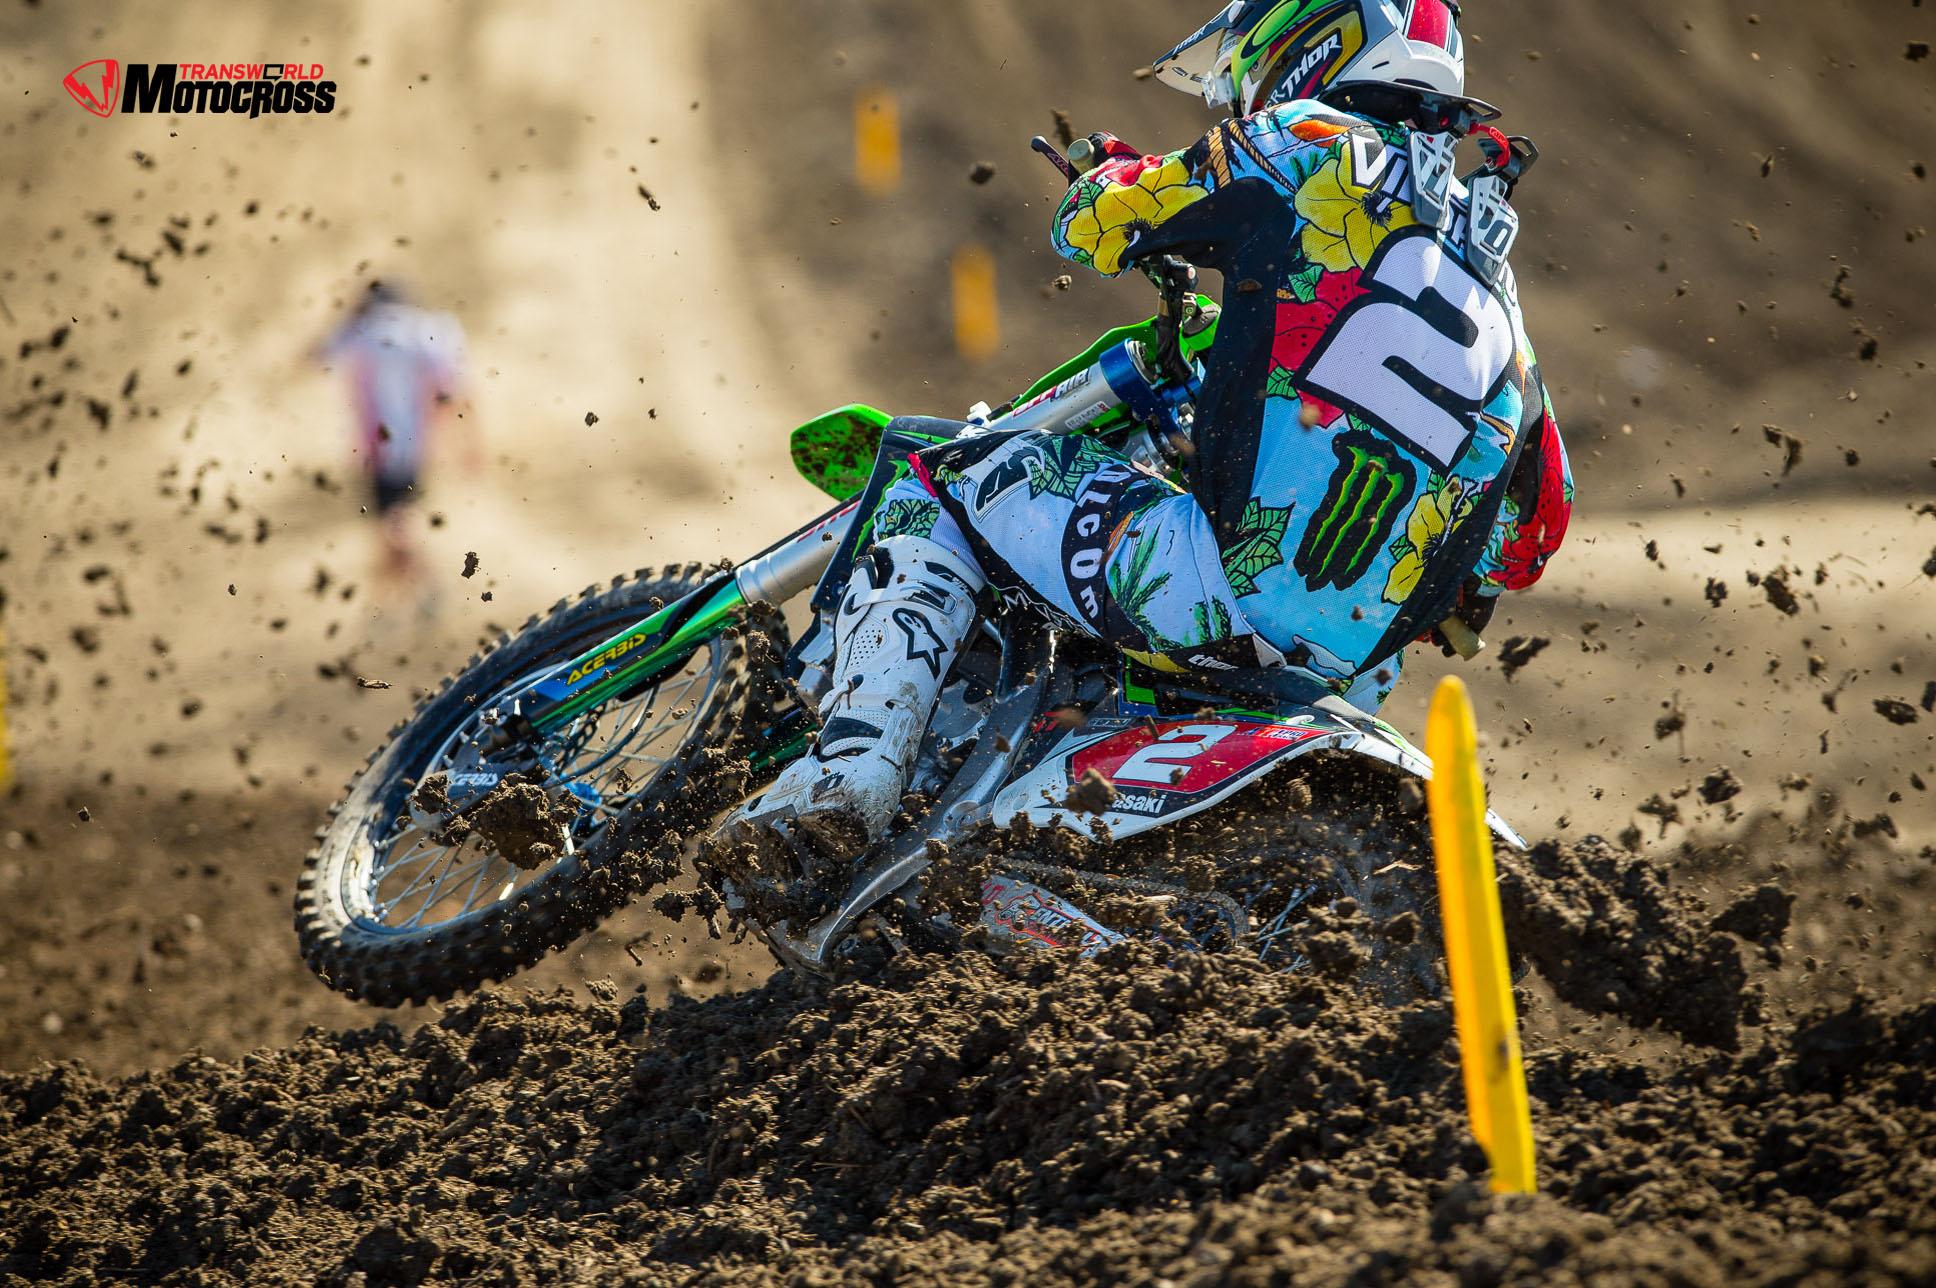 Wallpaper Motocross 37 Wallpapers – Adorable Wallpapers